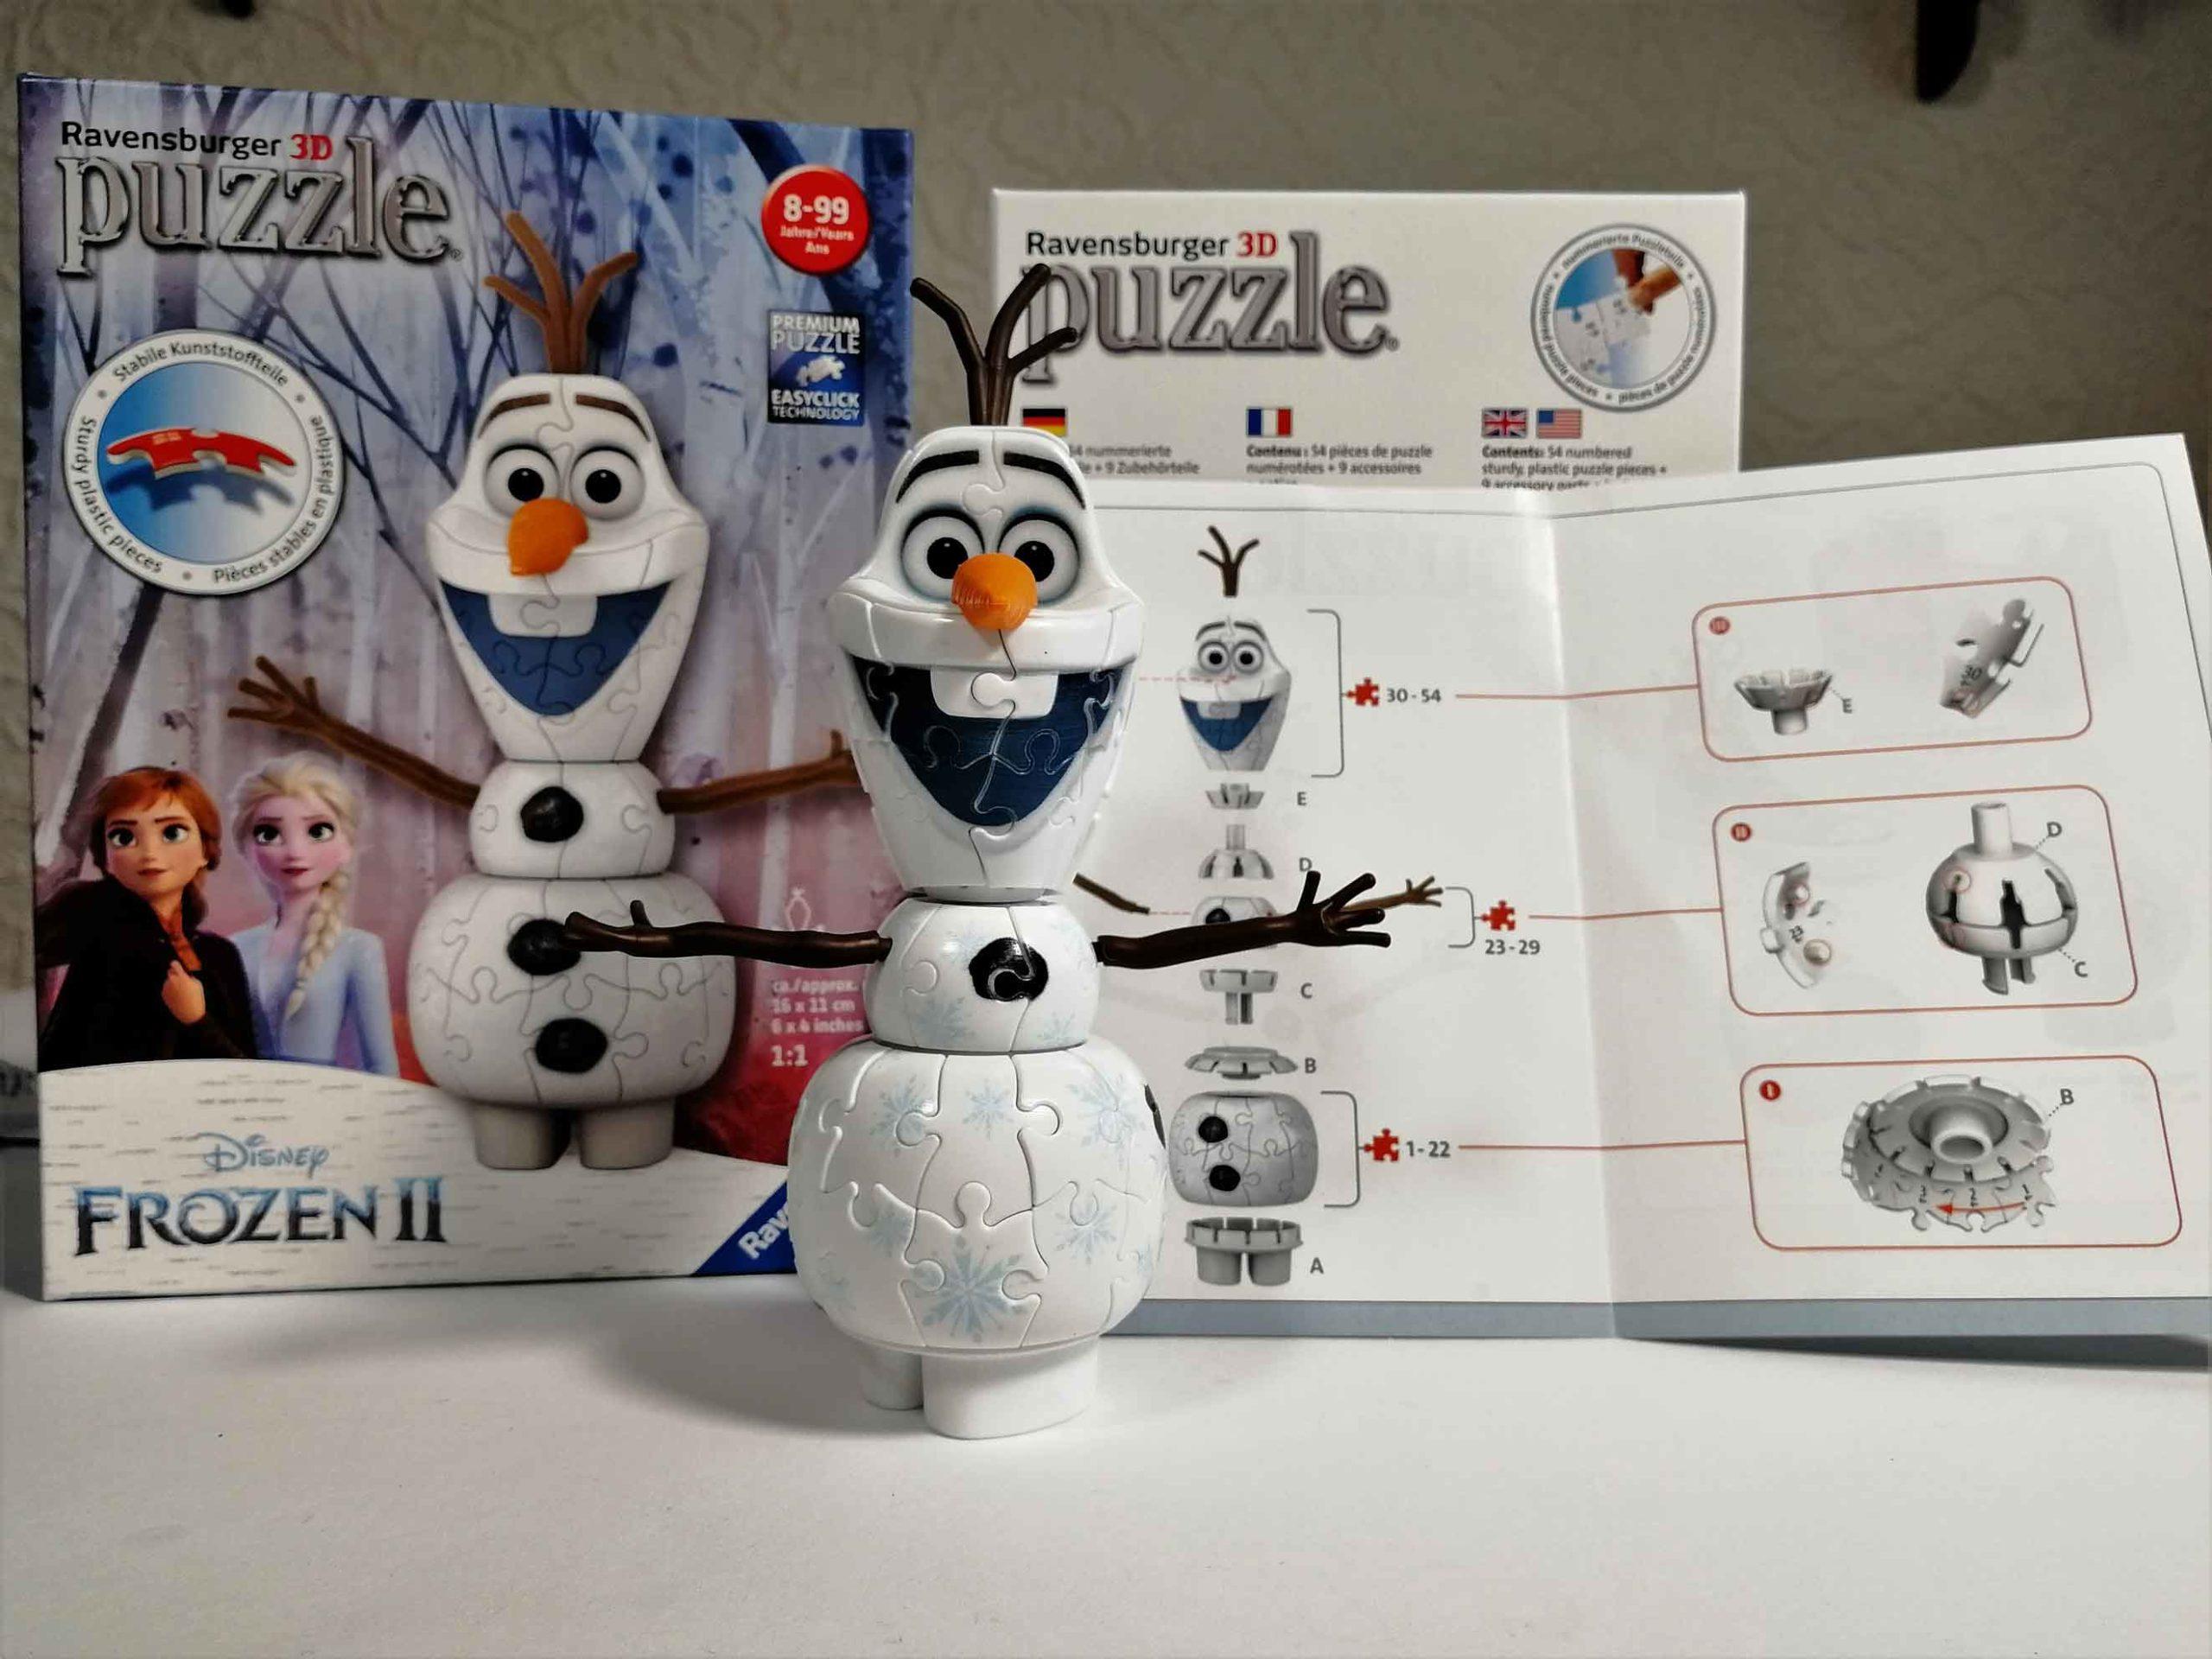 Ravensburger 3D Puzzle Olaf